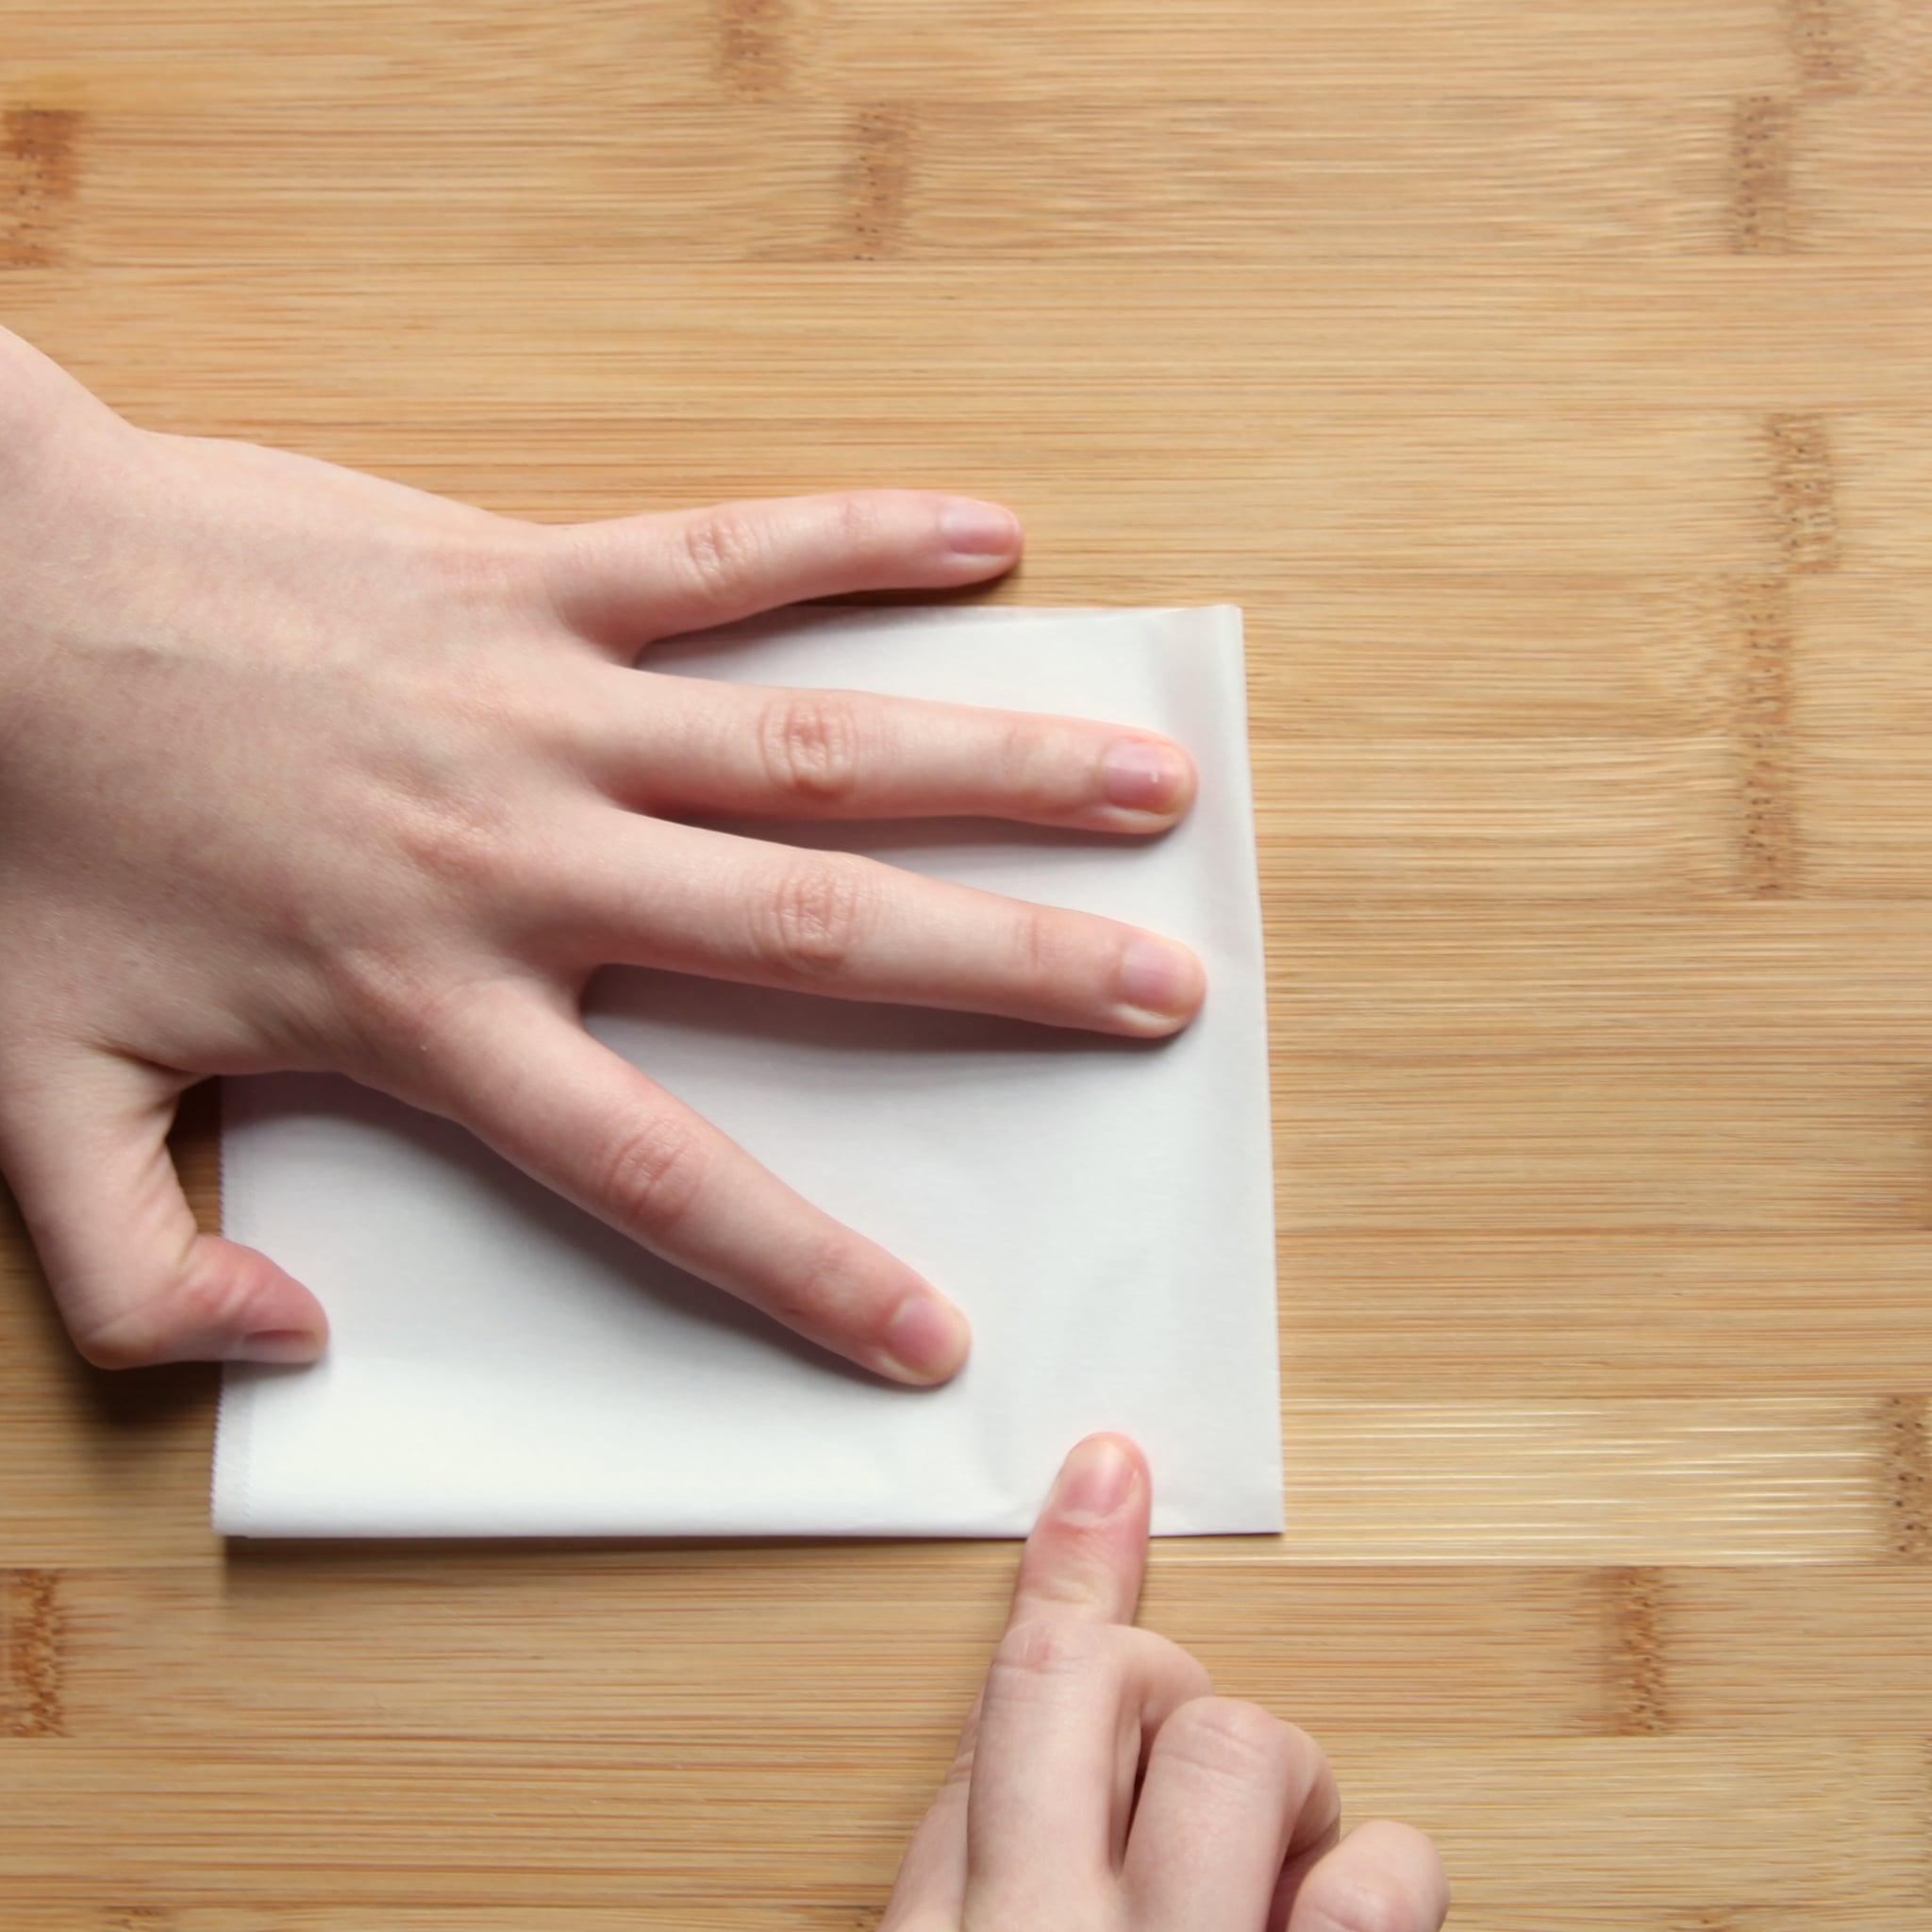 Fold the Rectangle Into a Square